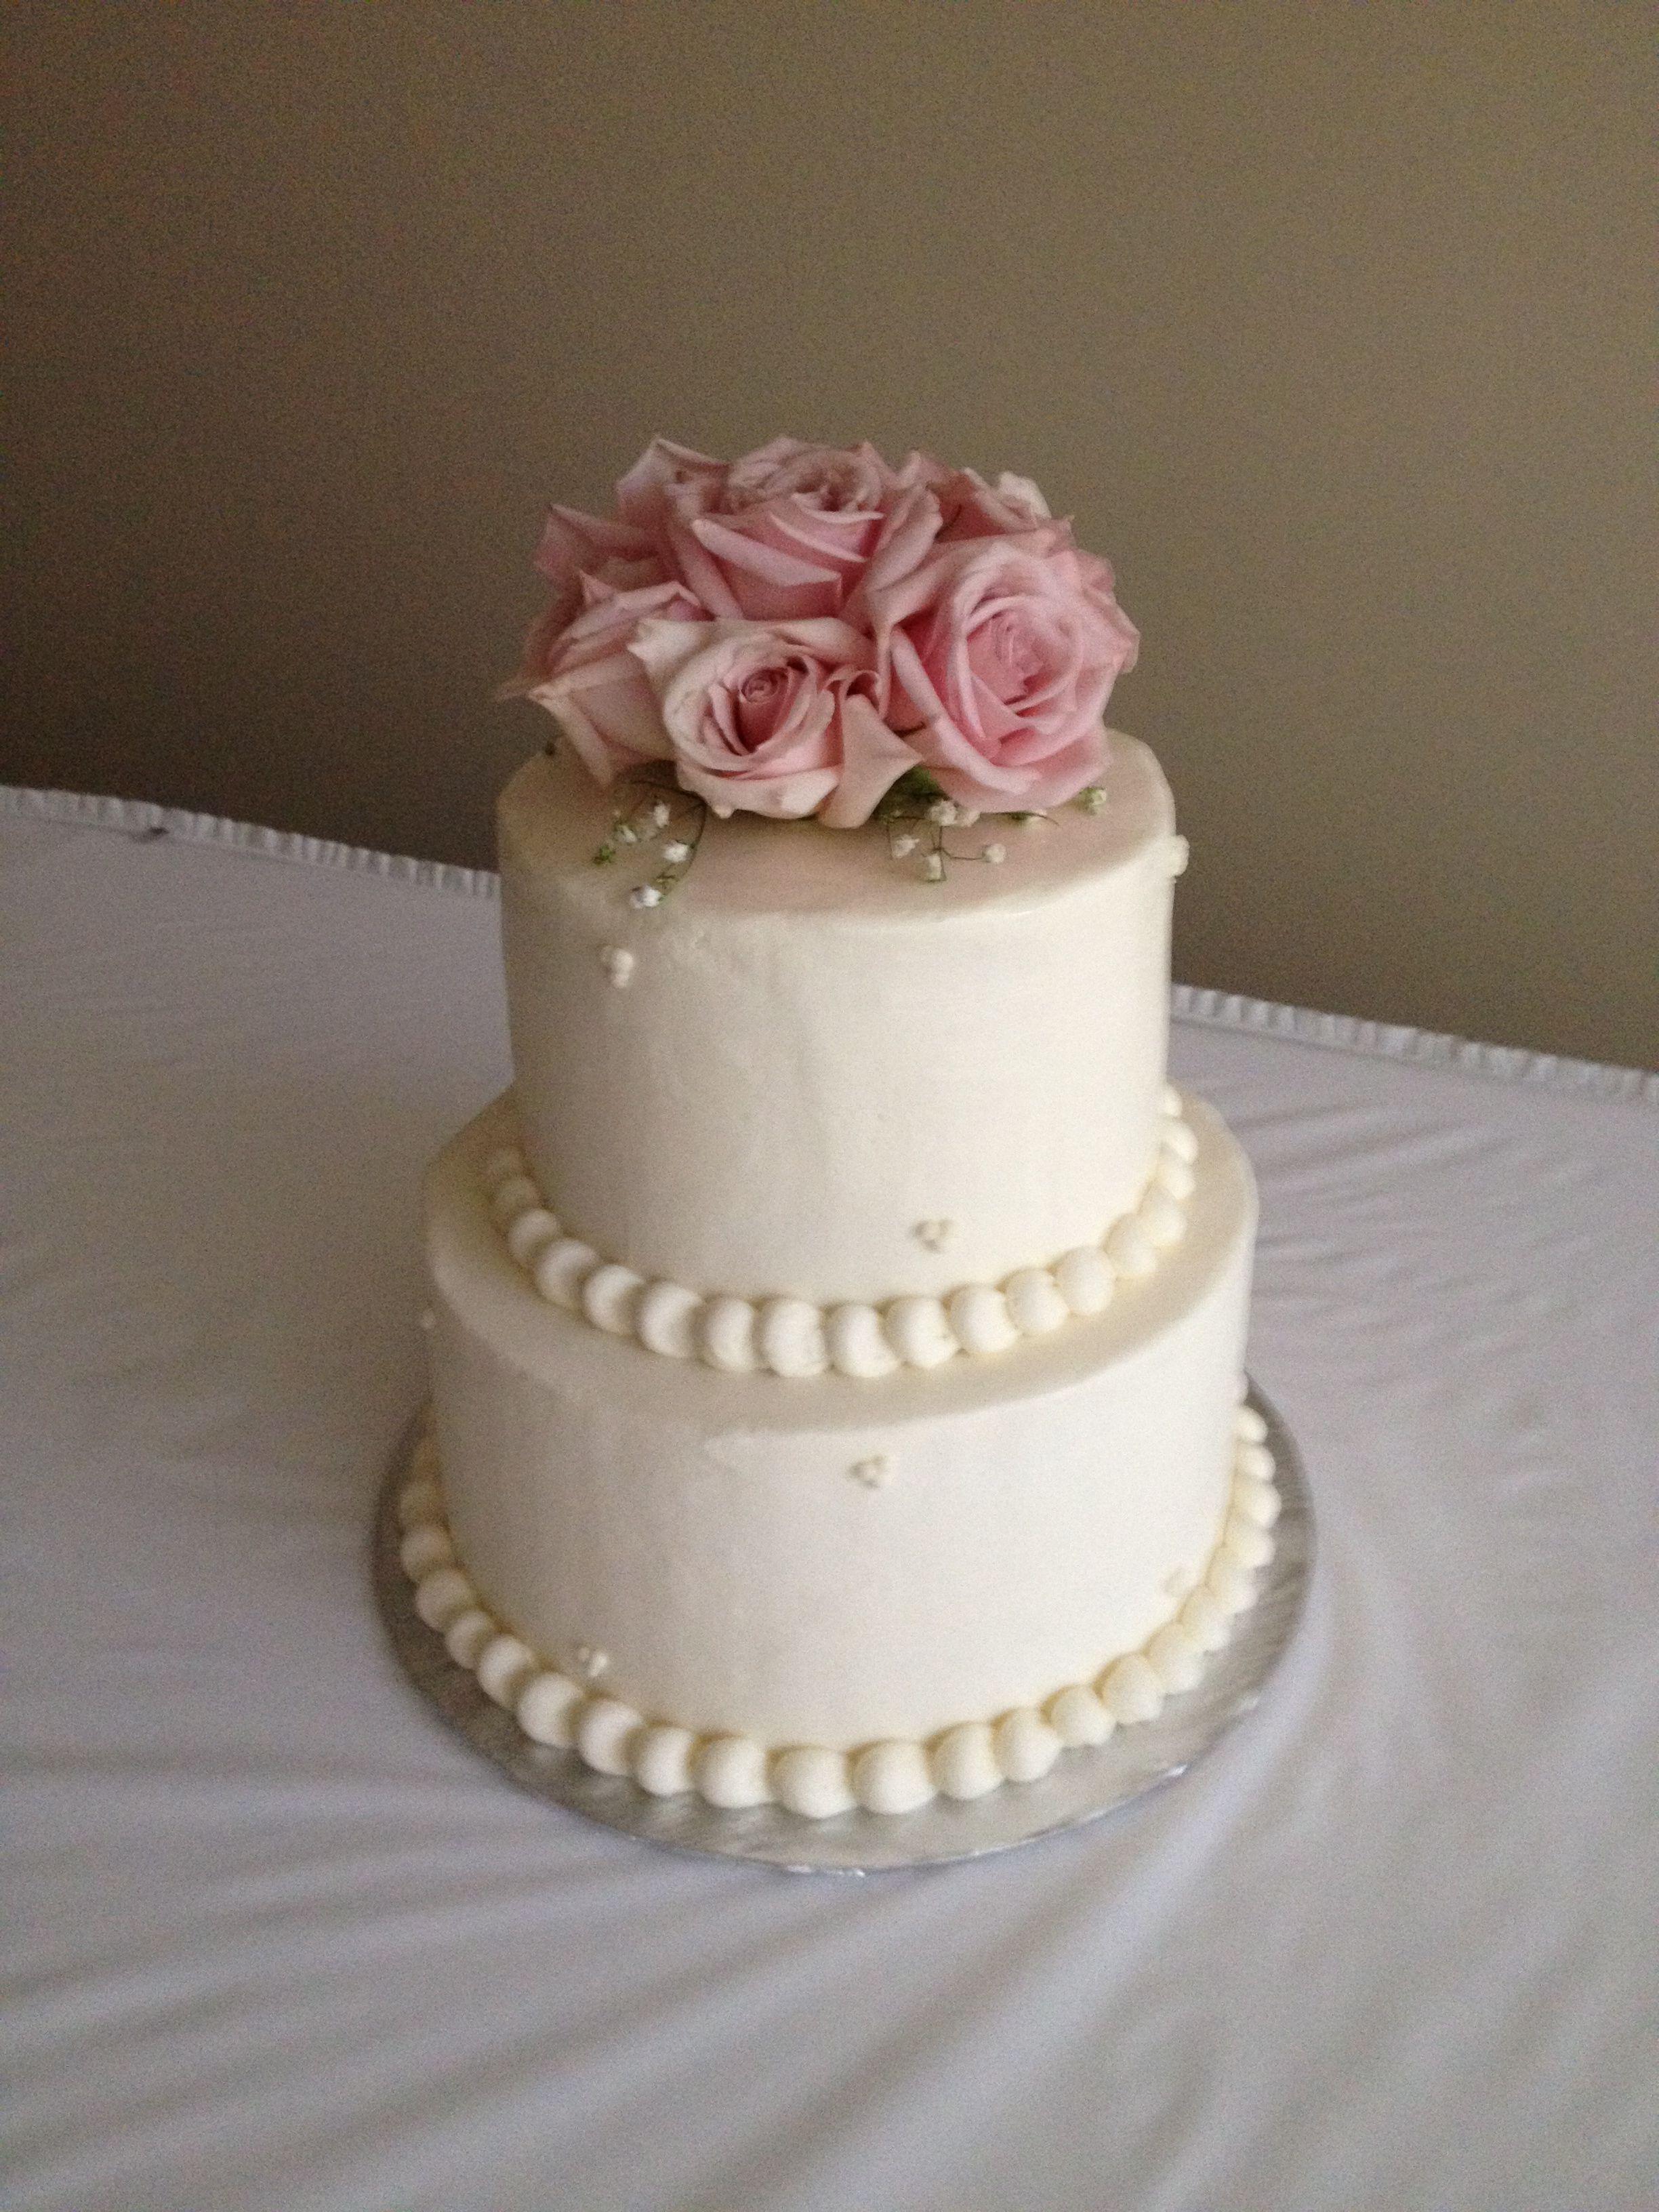 Gluten Free Wedding Cakesjodycakescom in HoustonTX